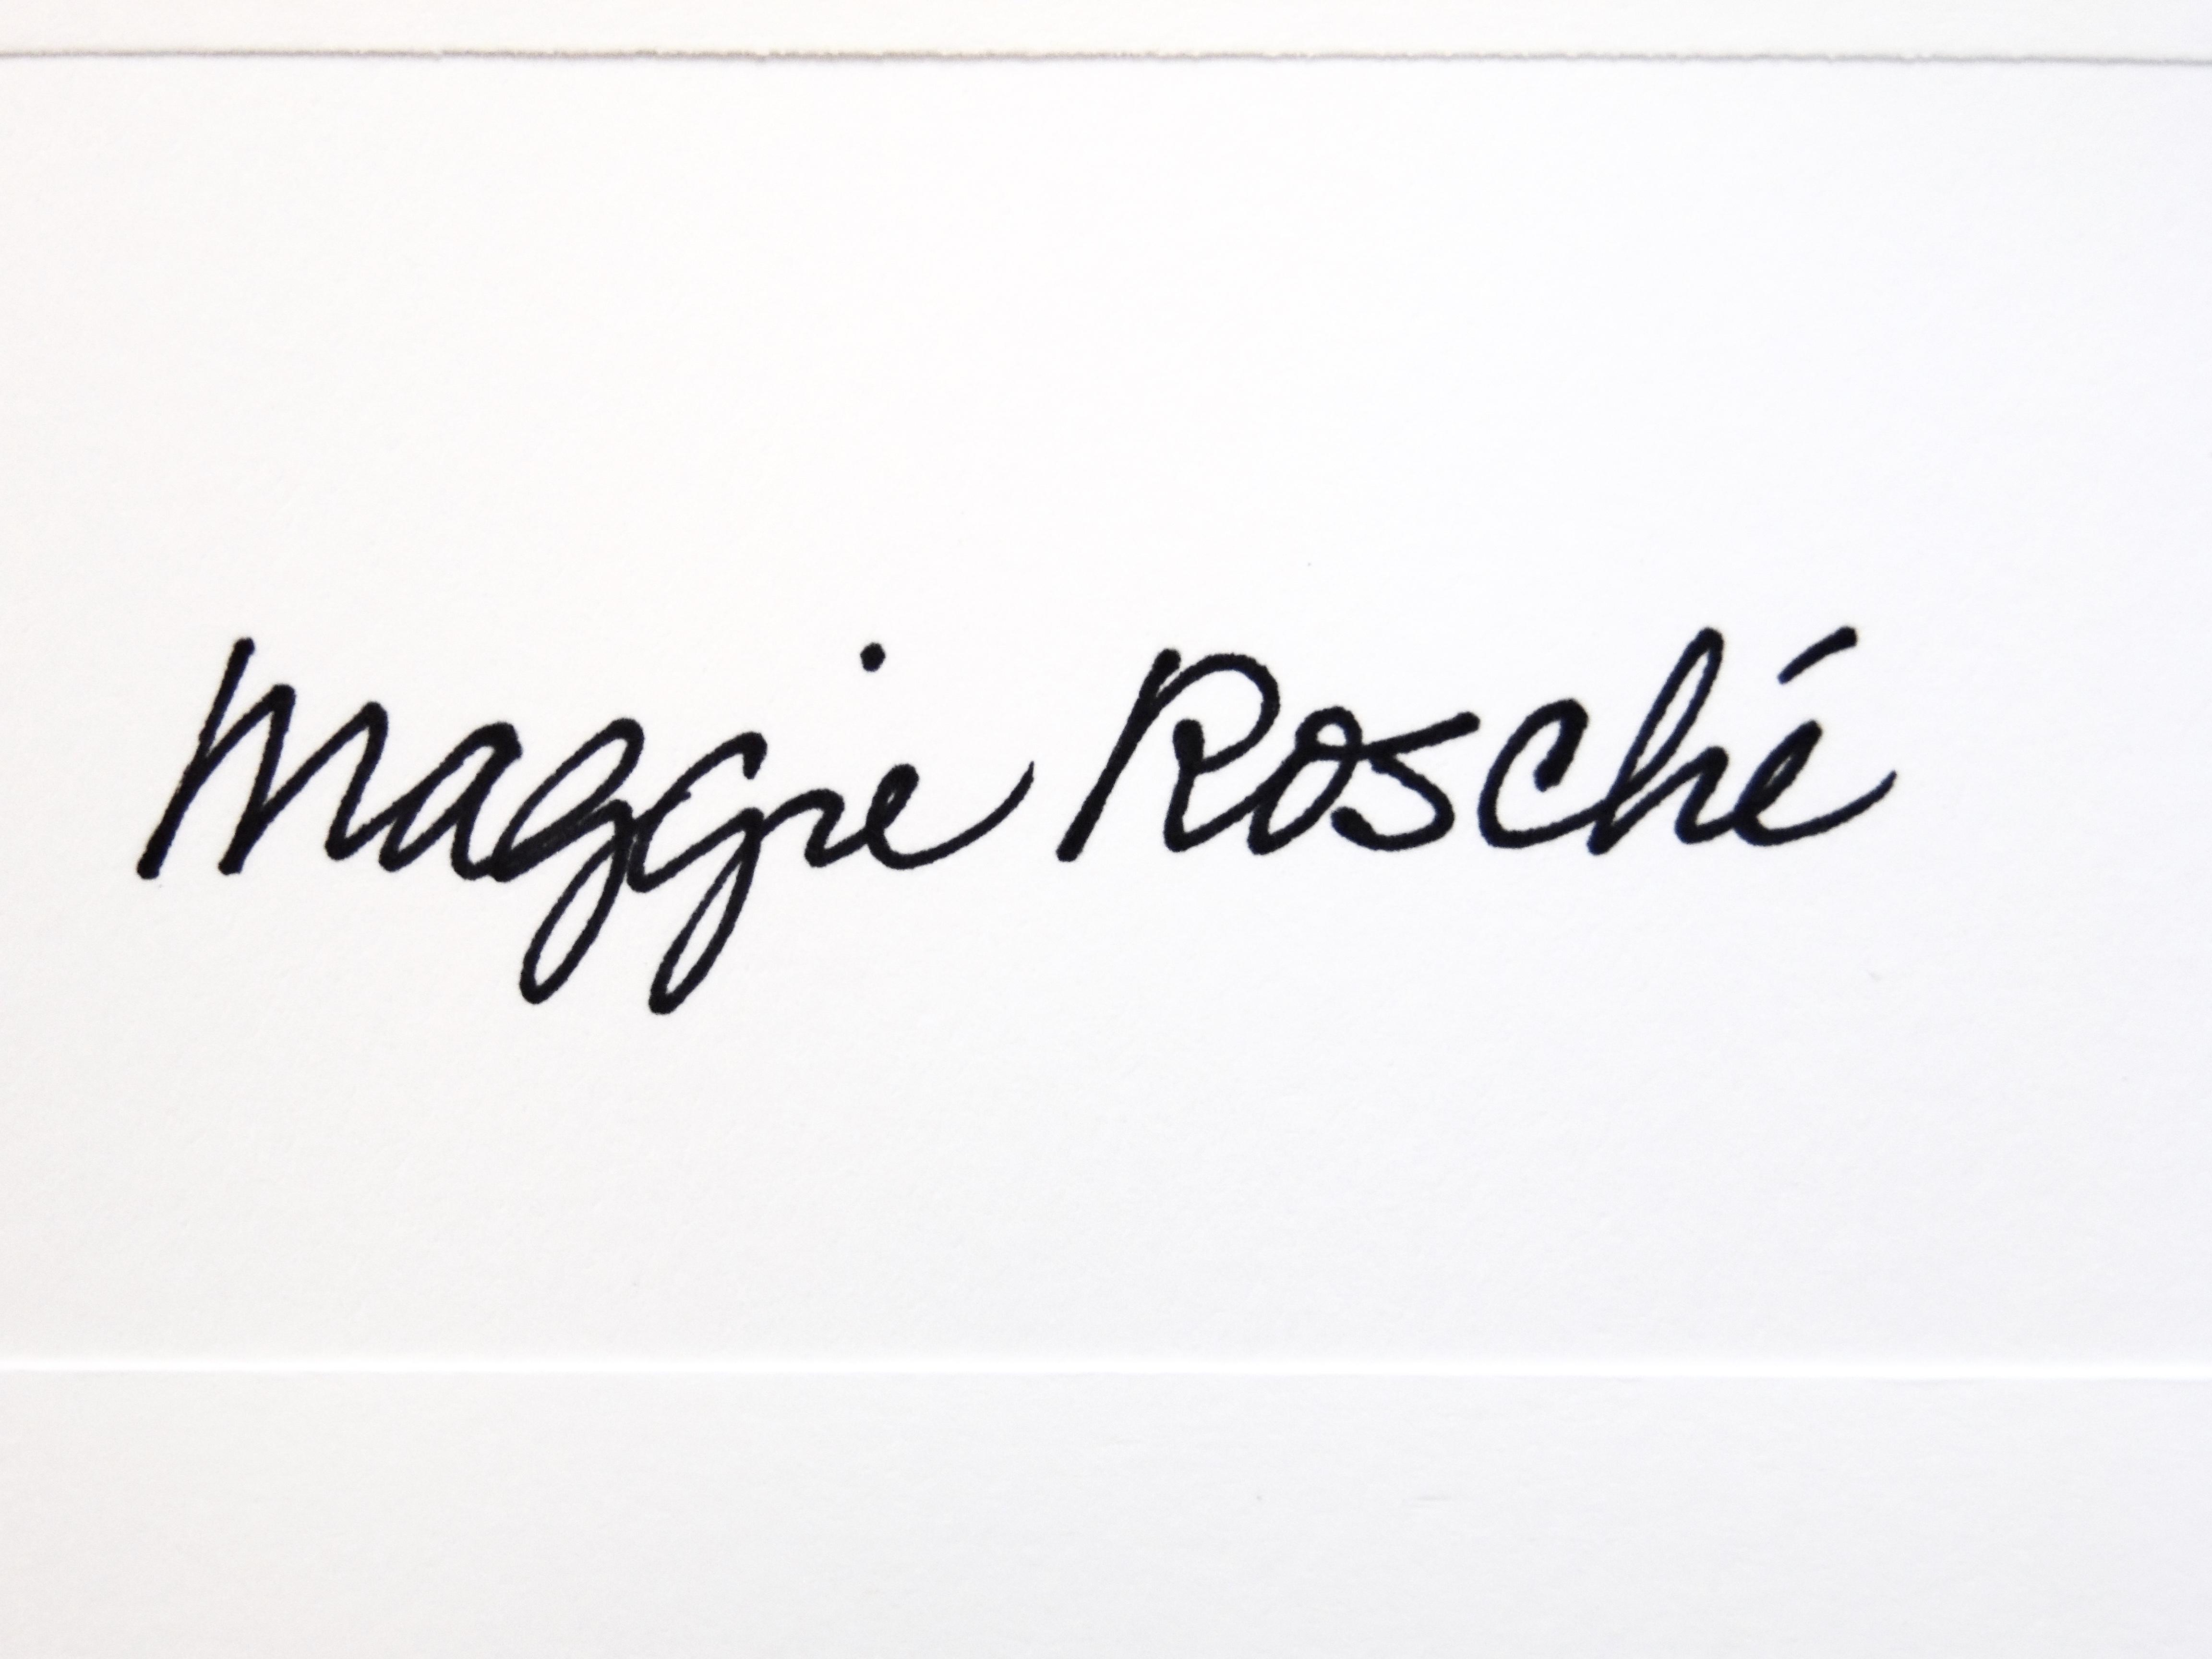 Maggie Rosché's Signature